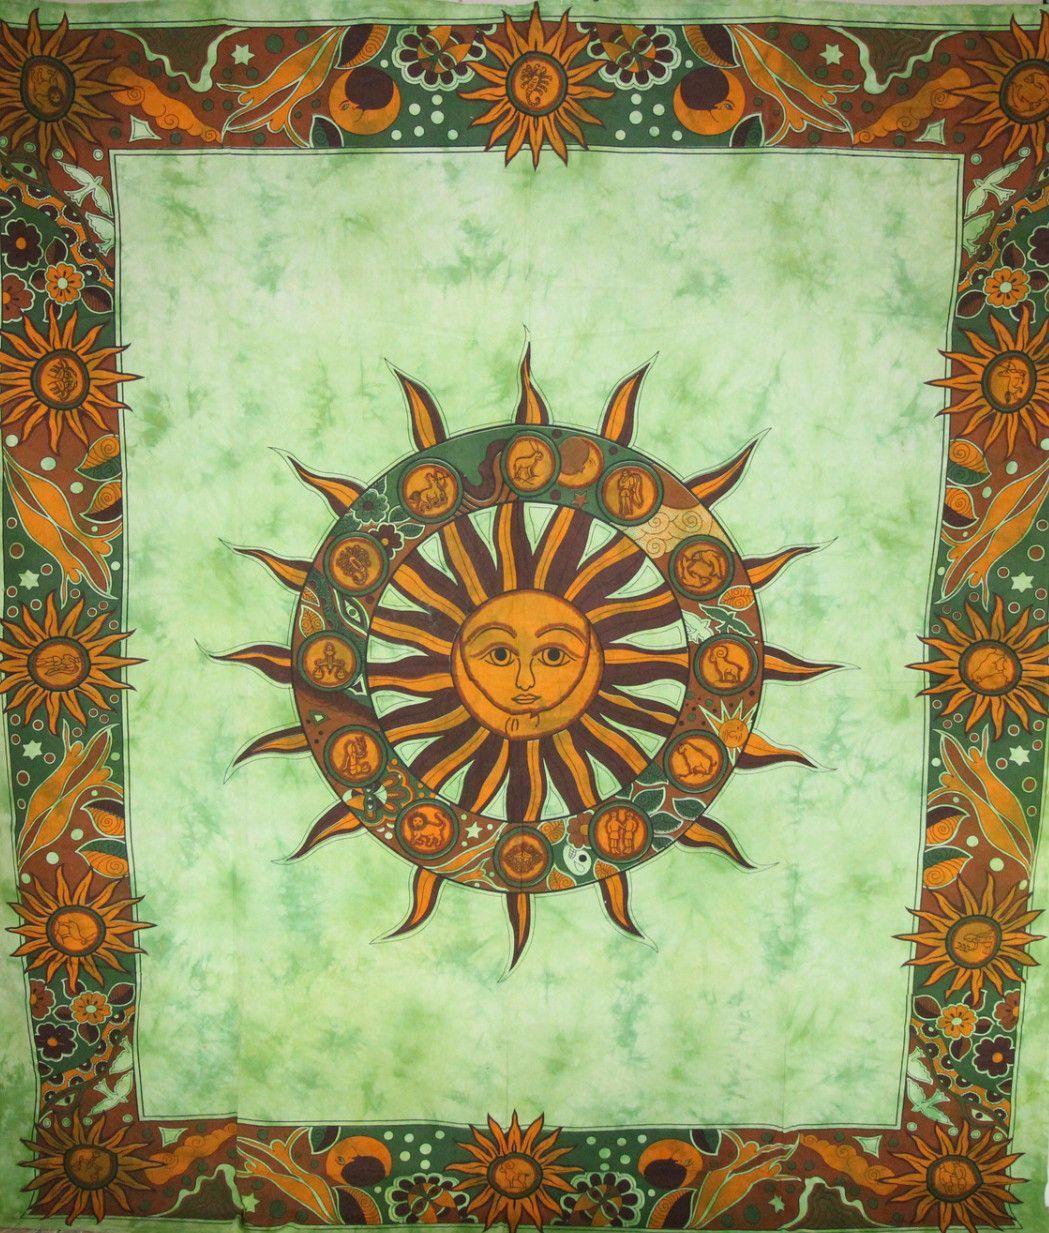 Sun Chakra & Sun Signs Artwork Decorative Tapestry | Chakra ...